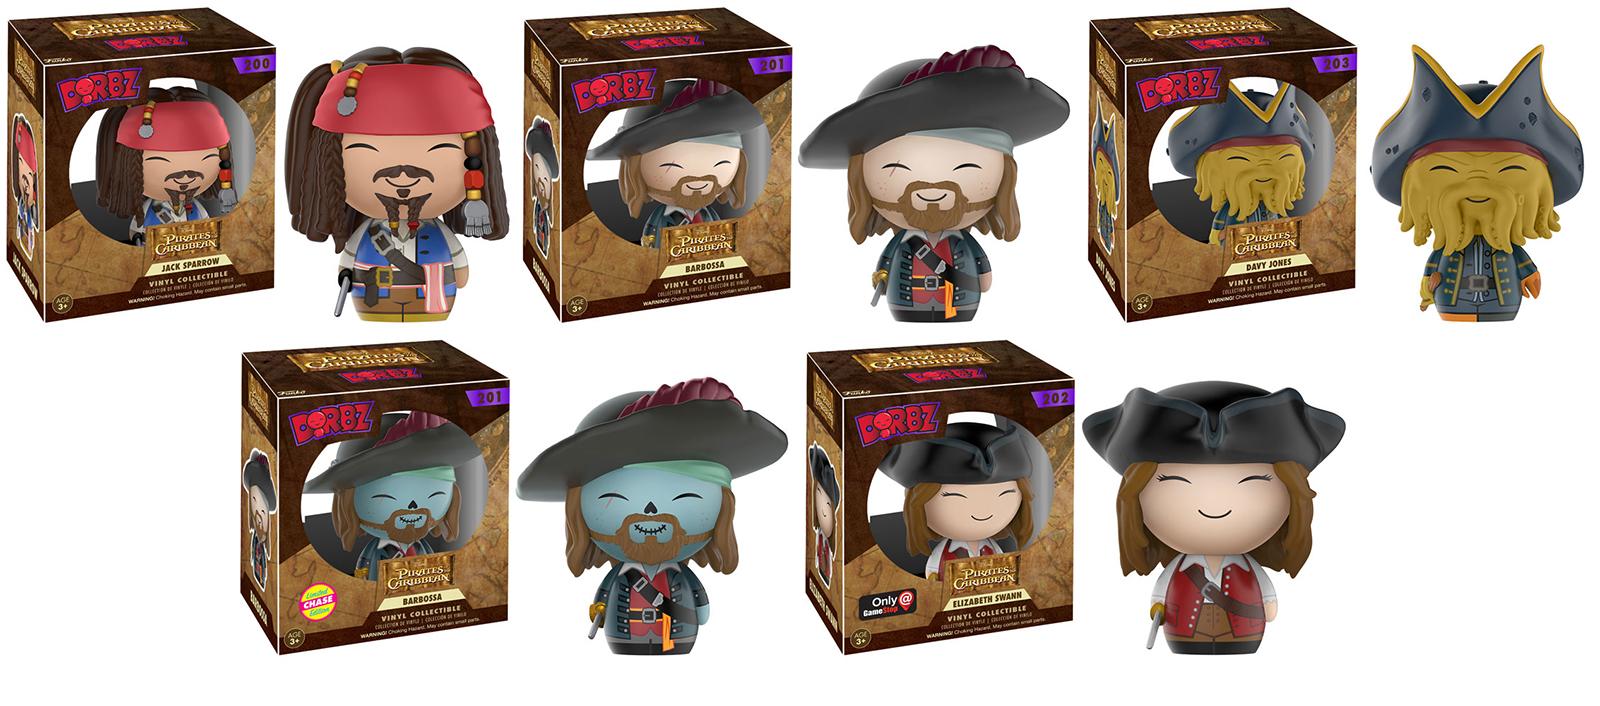 Pirates Of The Caribbean clipart potc Potc Pirates Plush dorbz Pirates